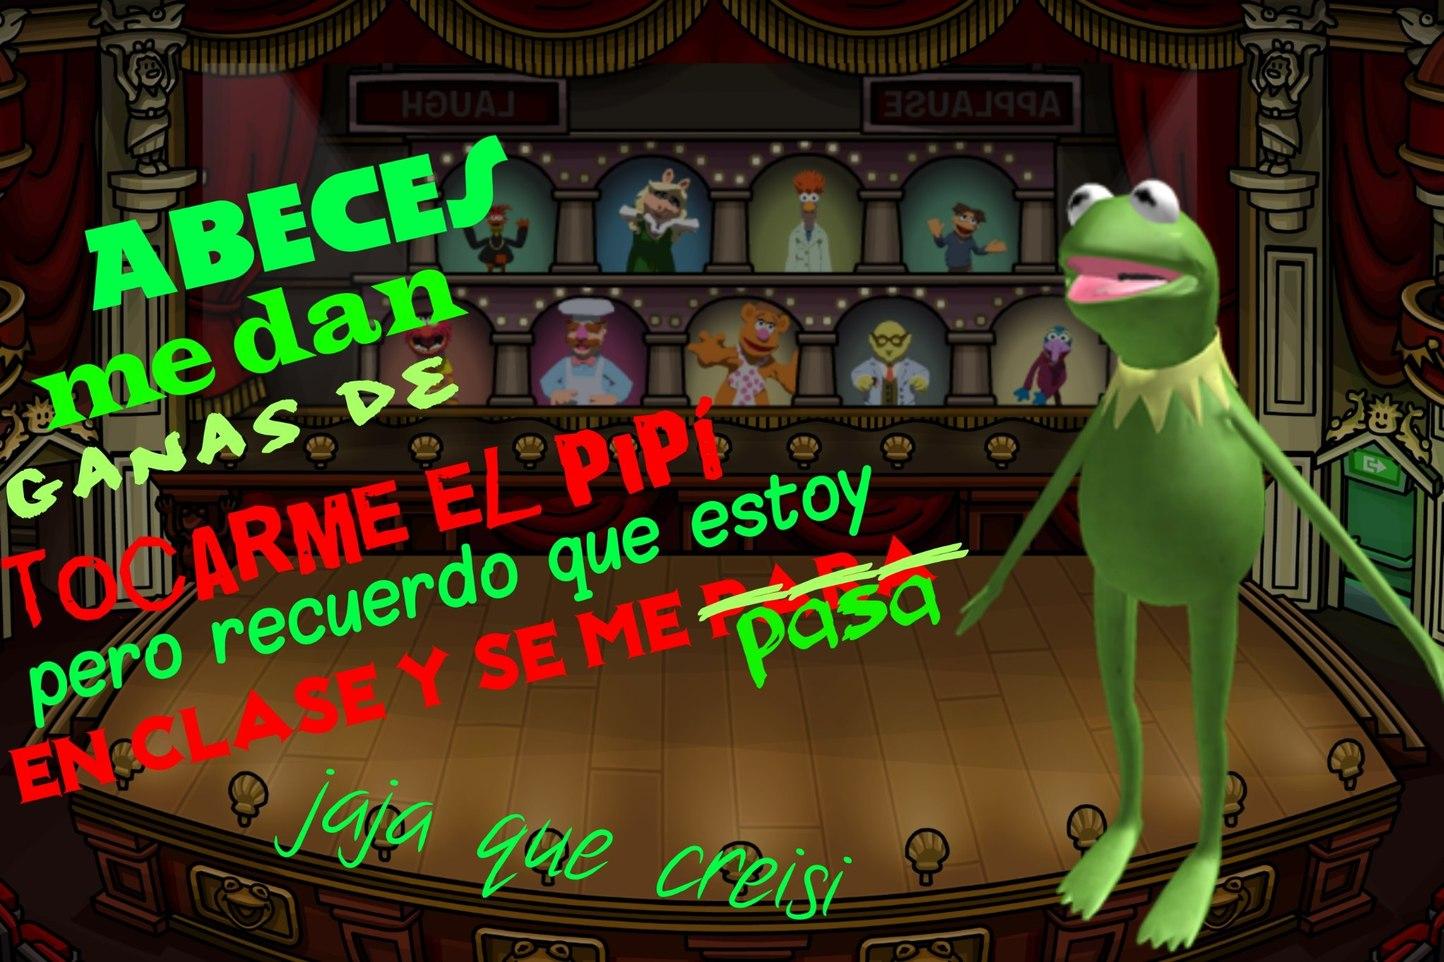 Kermit la p̶a̶j̶a̶ rana - meme